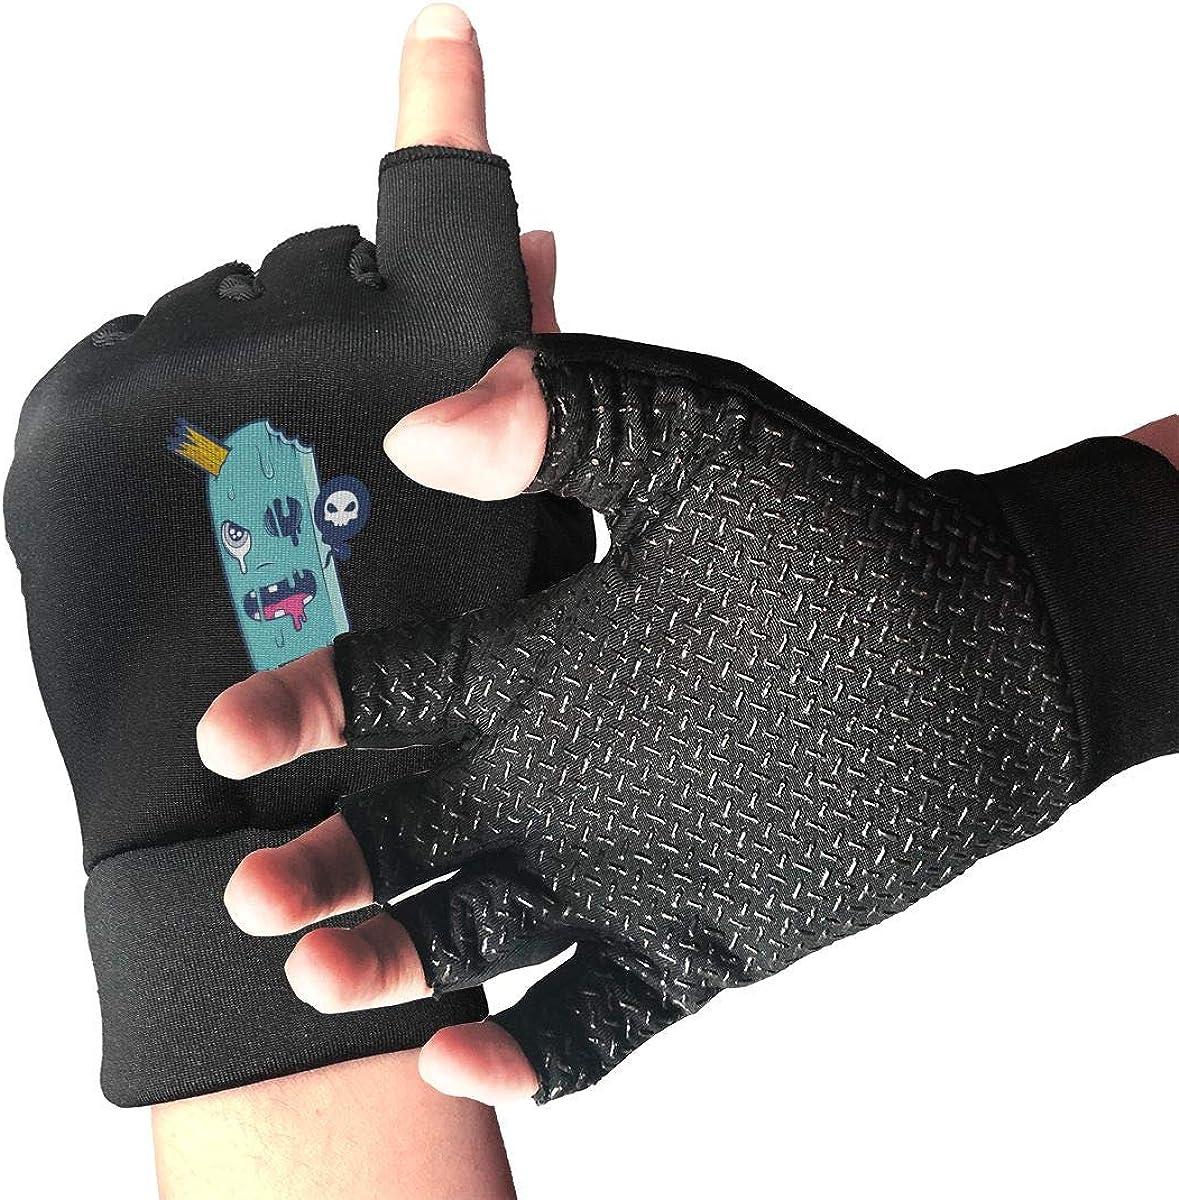 Gloves Creative Popsicle Fingerless Gloves Short Touchscreen Gloves Winter Motorcycle Biker Mitten